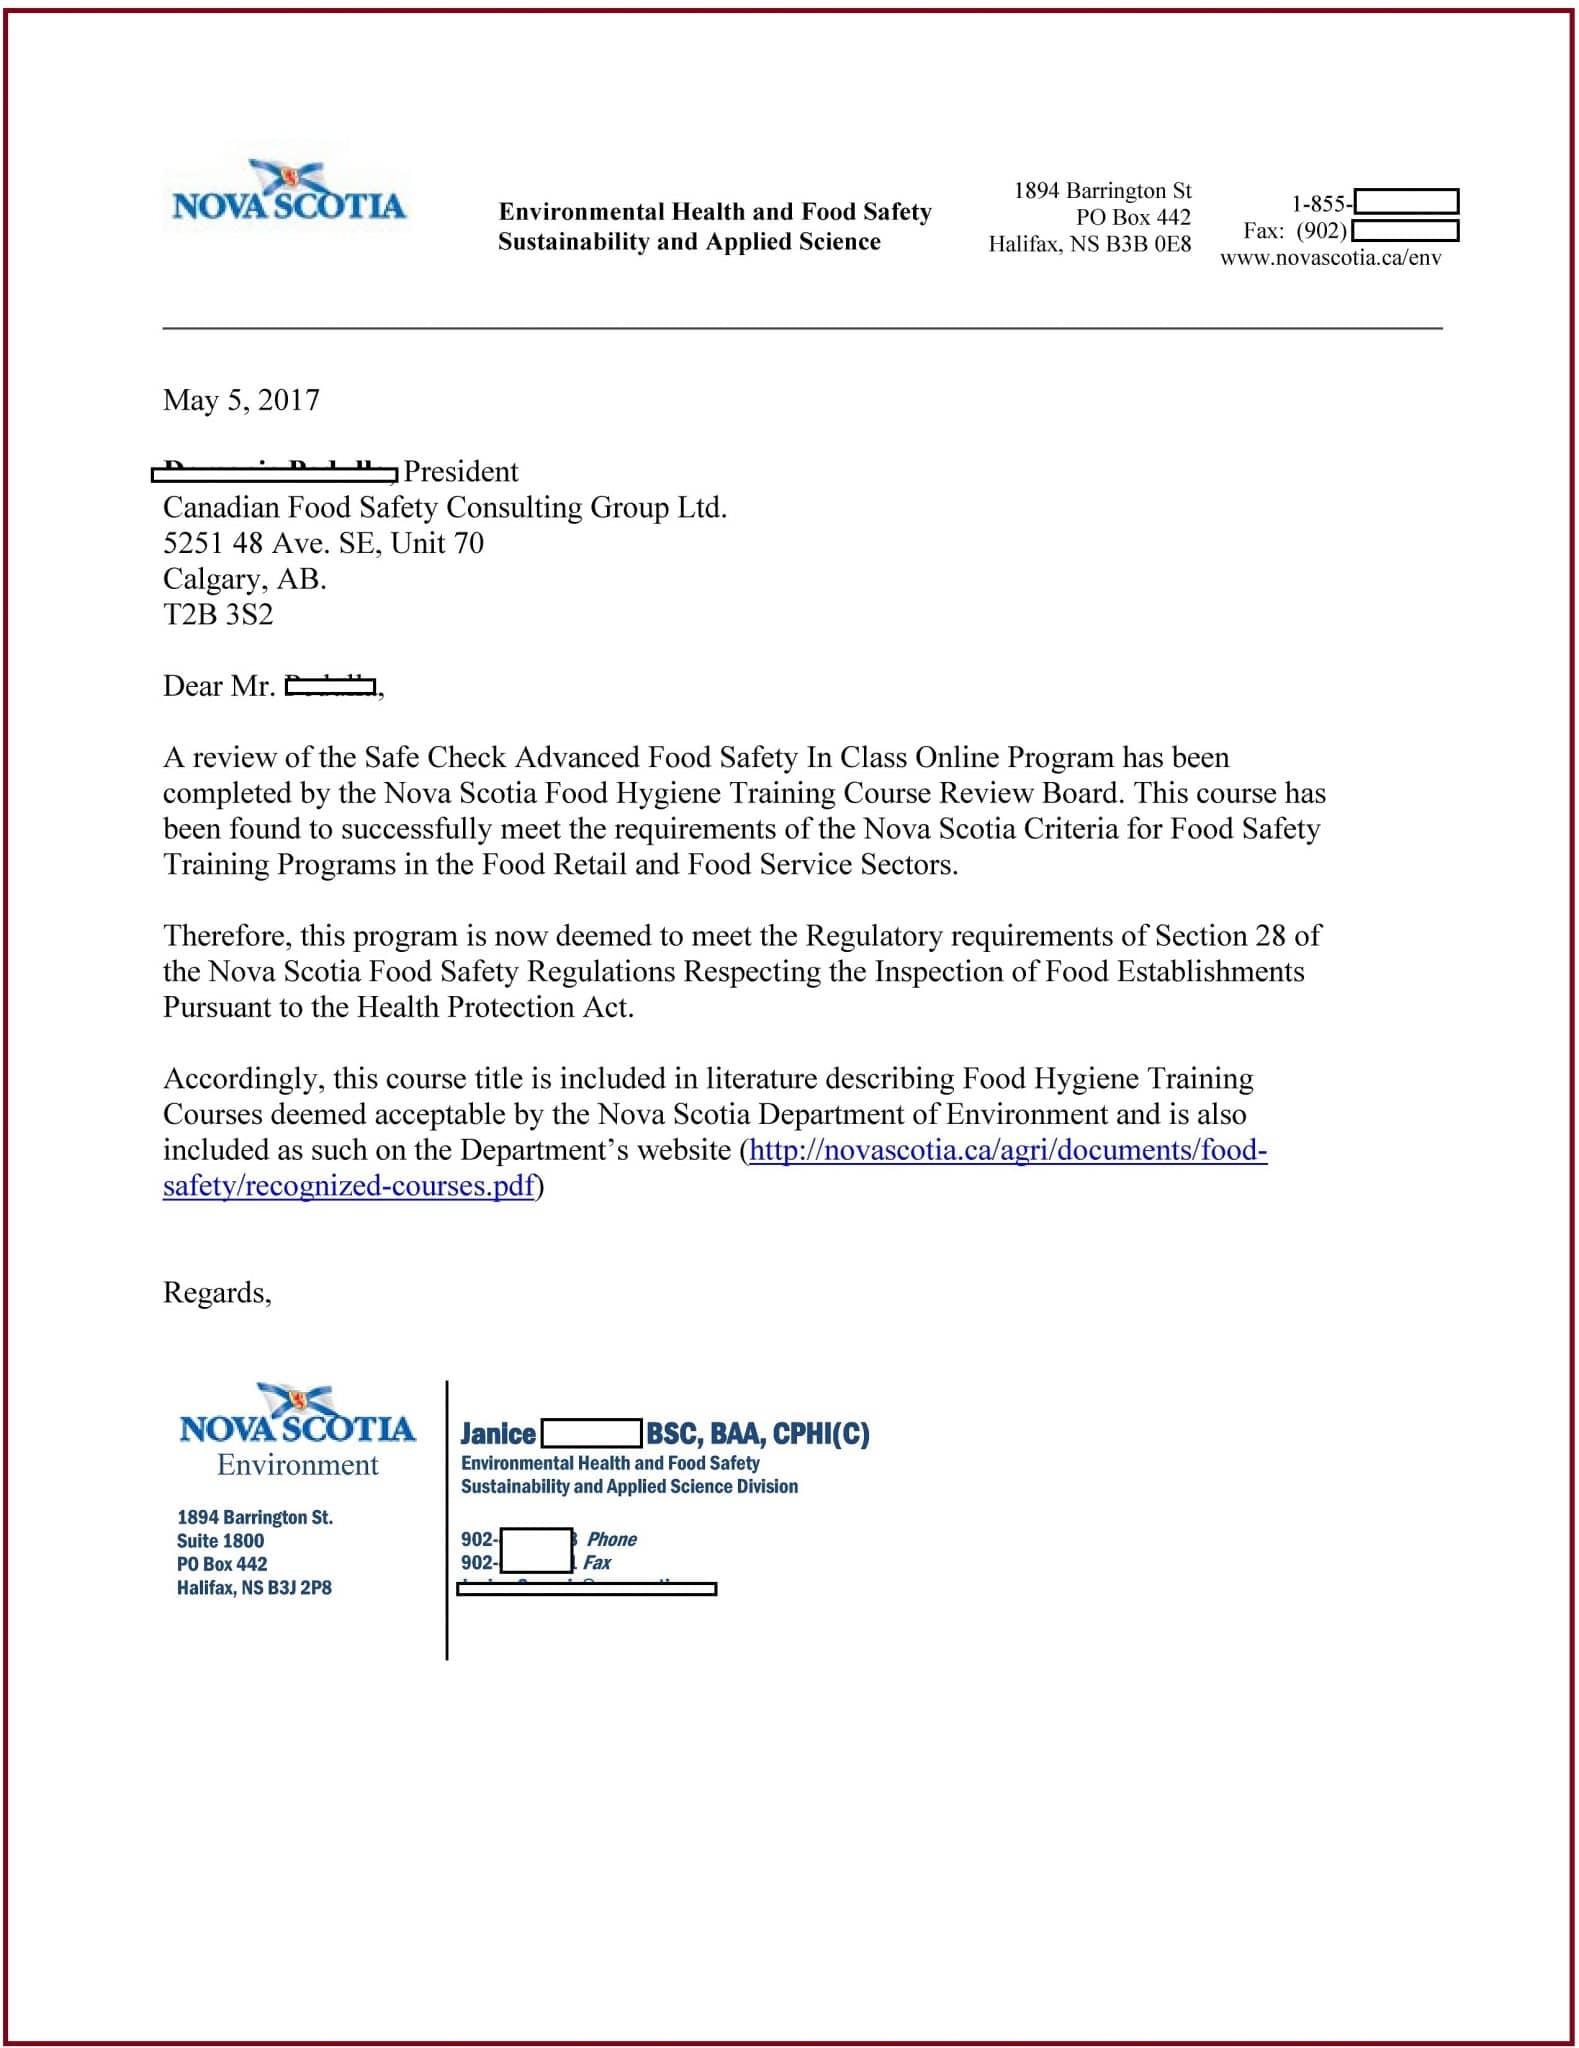 Nova Scotia - Food Safety Course Approval - A